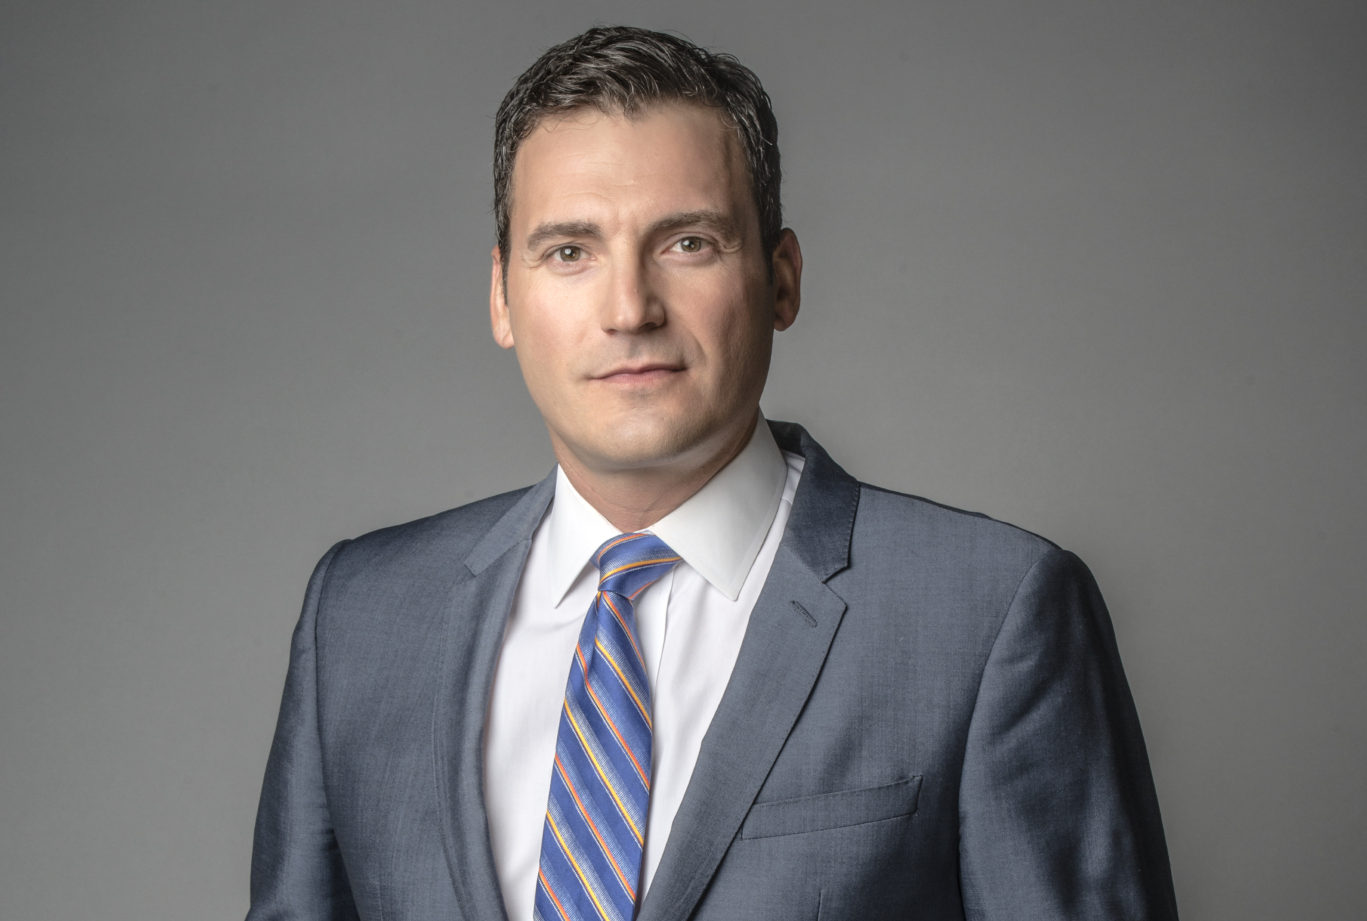 Evan Solomon Named New Host of CTV News Channel's POWER PLAY